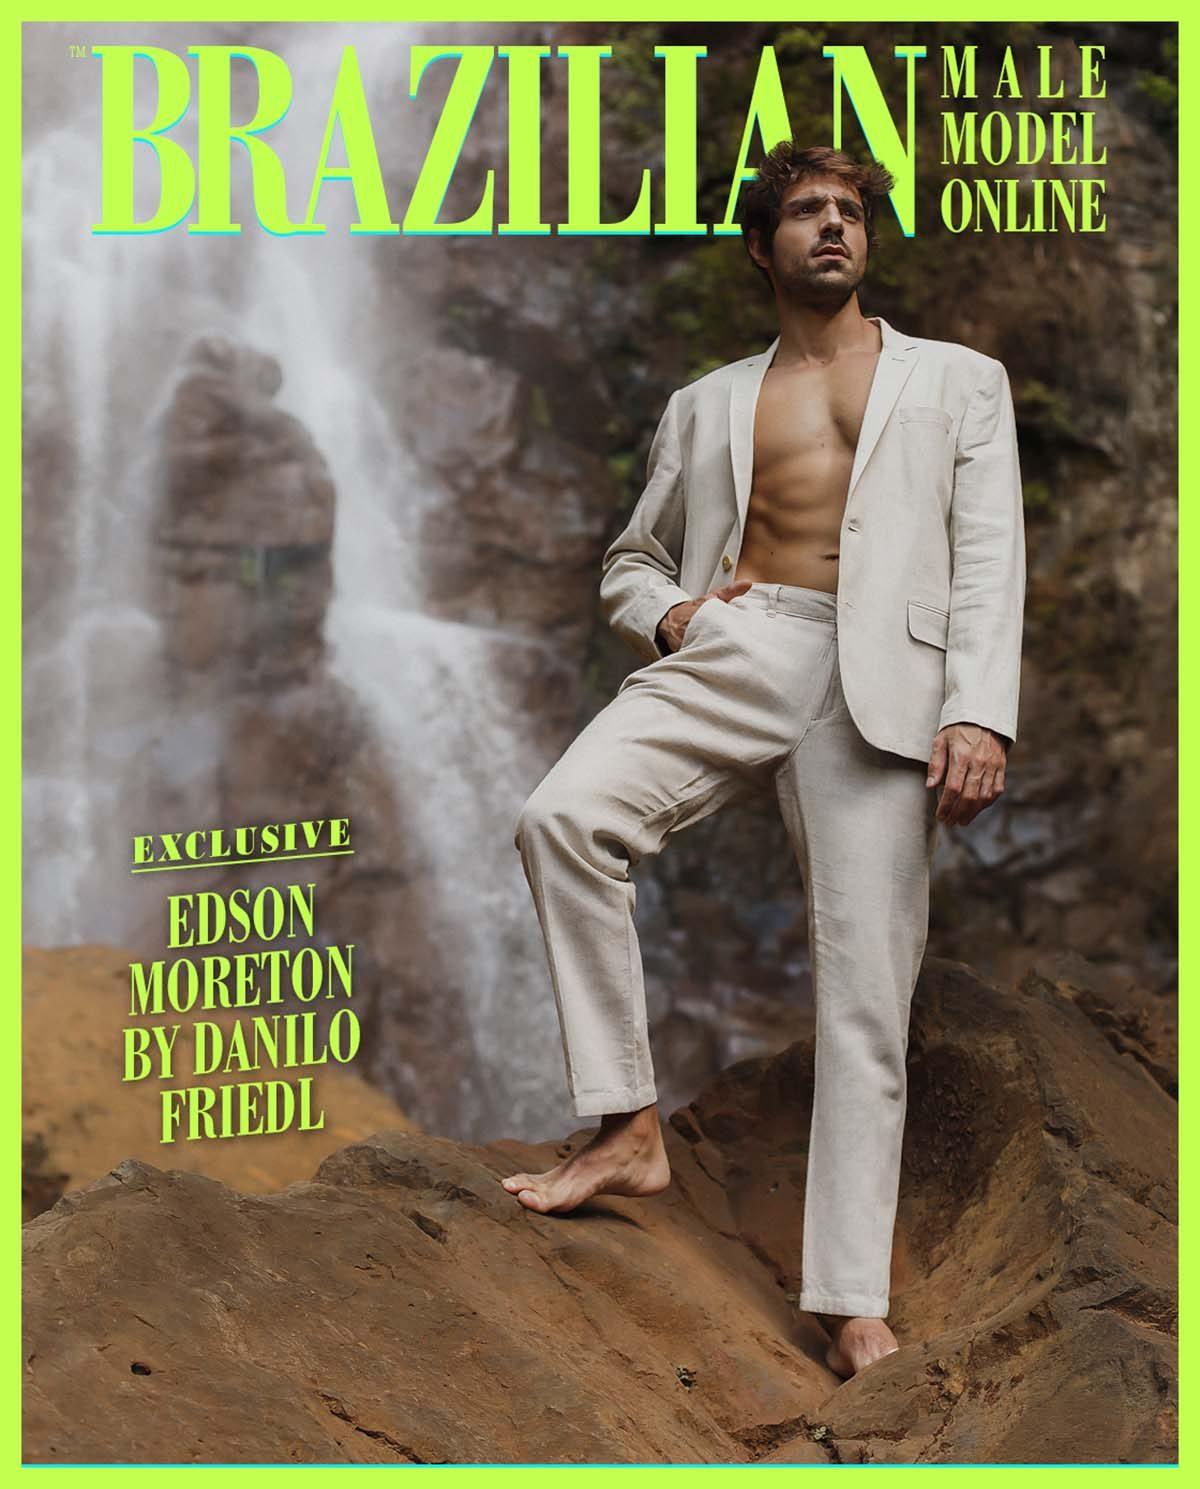 Edson Moreton by Danilo Friedl